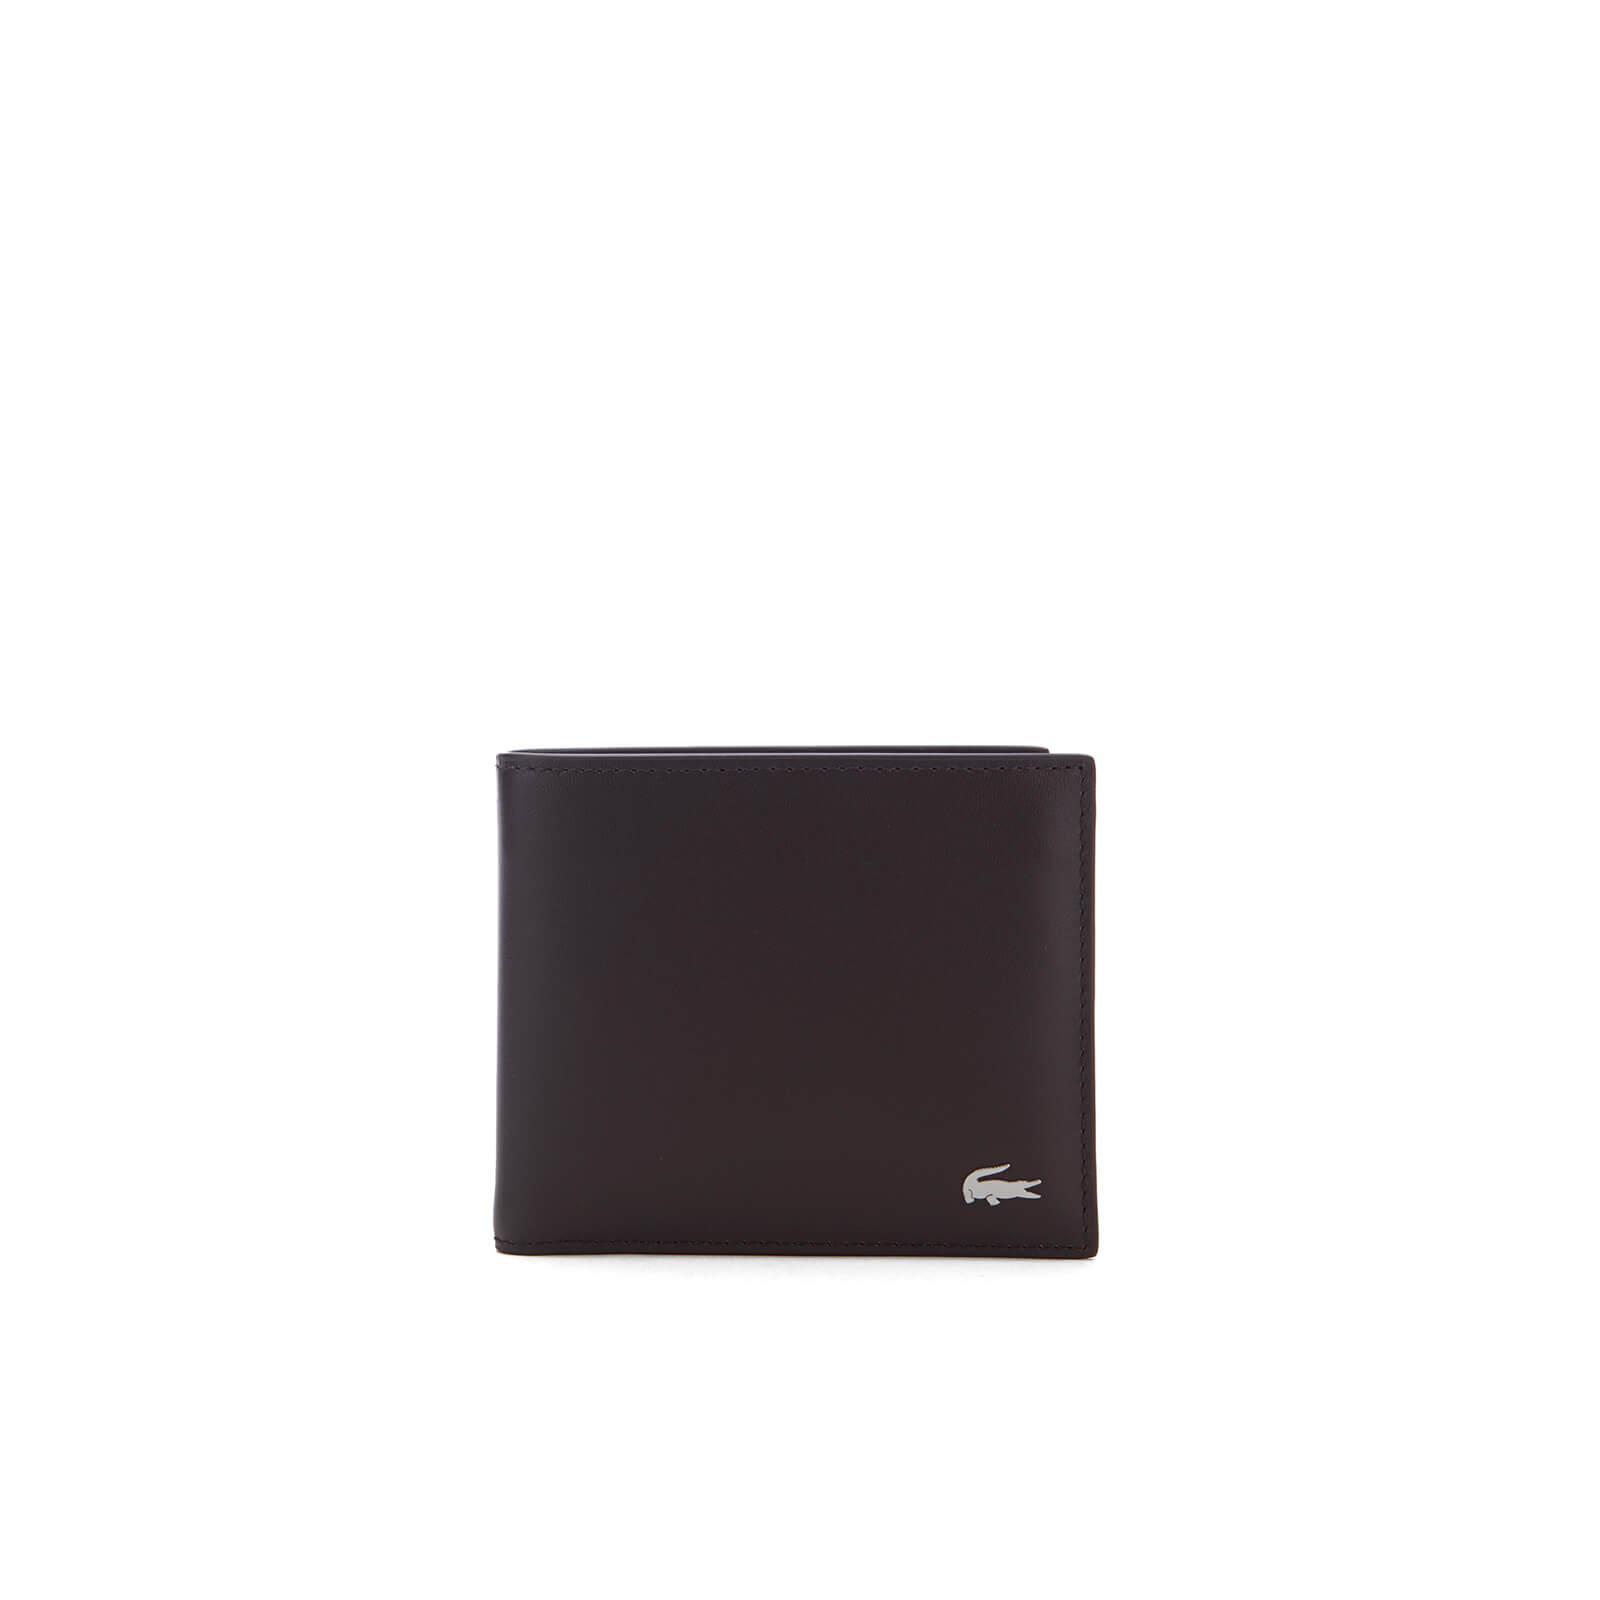 94b34d0d Lacoste Men's Large Billfold Wallet - Brown